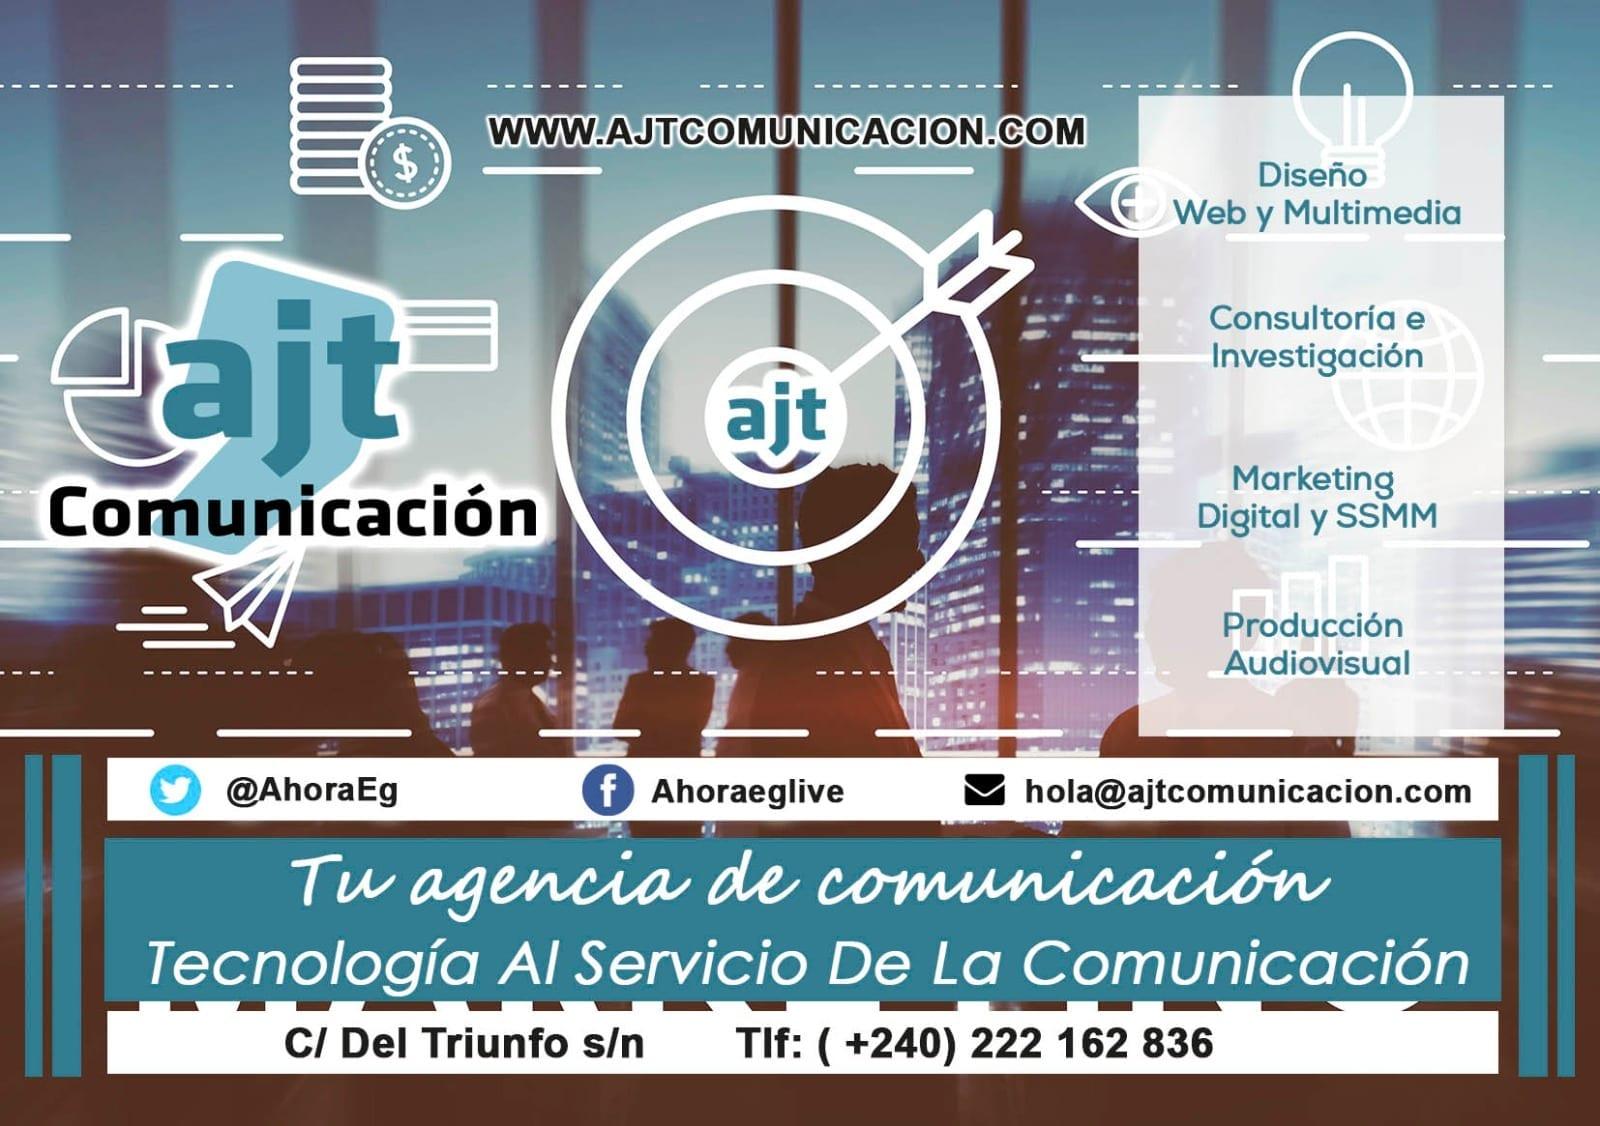 Así es AJT COMUNICACIÓN, la agencia de comunicación estratégica en Guinea Ecuatorial